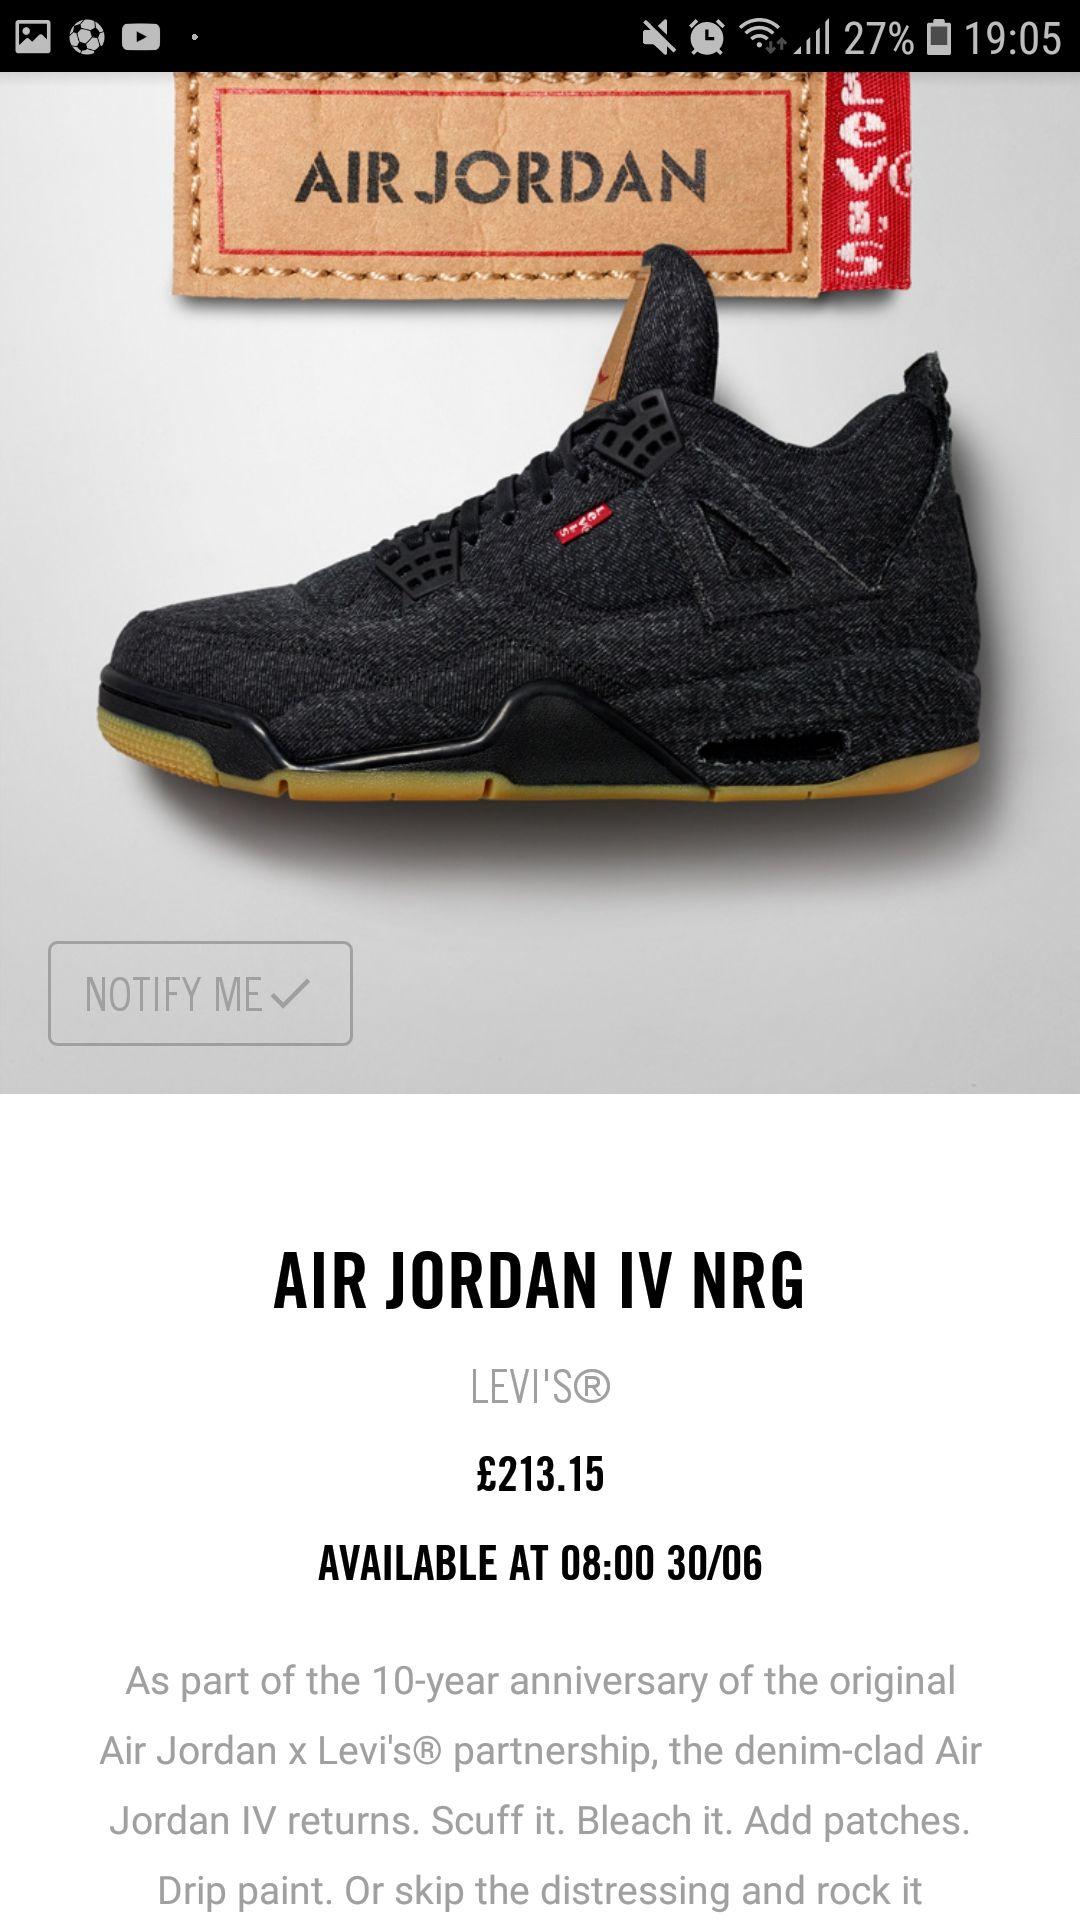 e4247db379e85 adidas NMD Human Race Trail Pharrell Williams Oreo - Black White Trainer  Size 7 UK  Amazon.co.uk  Shoes   Bags